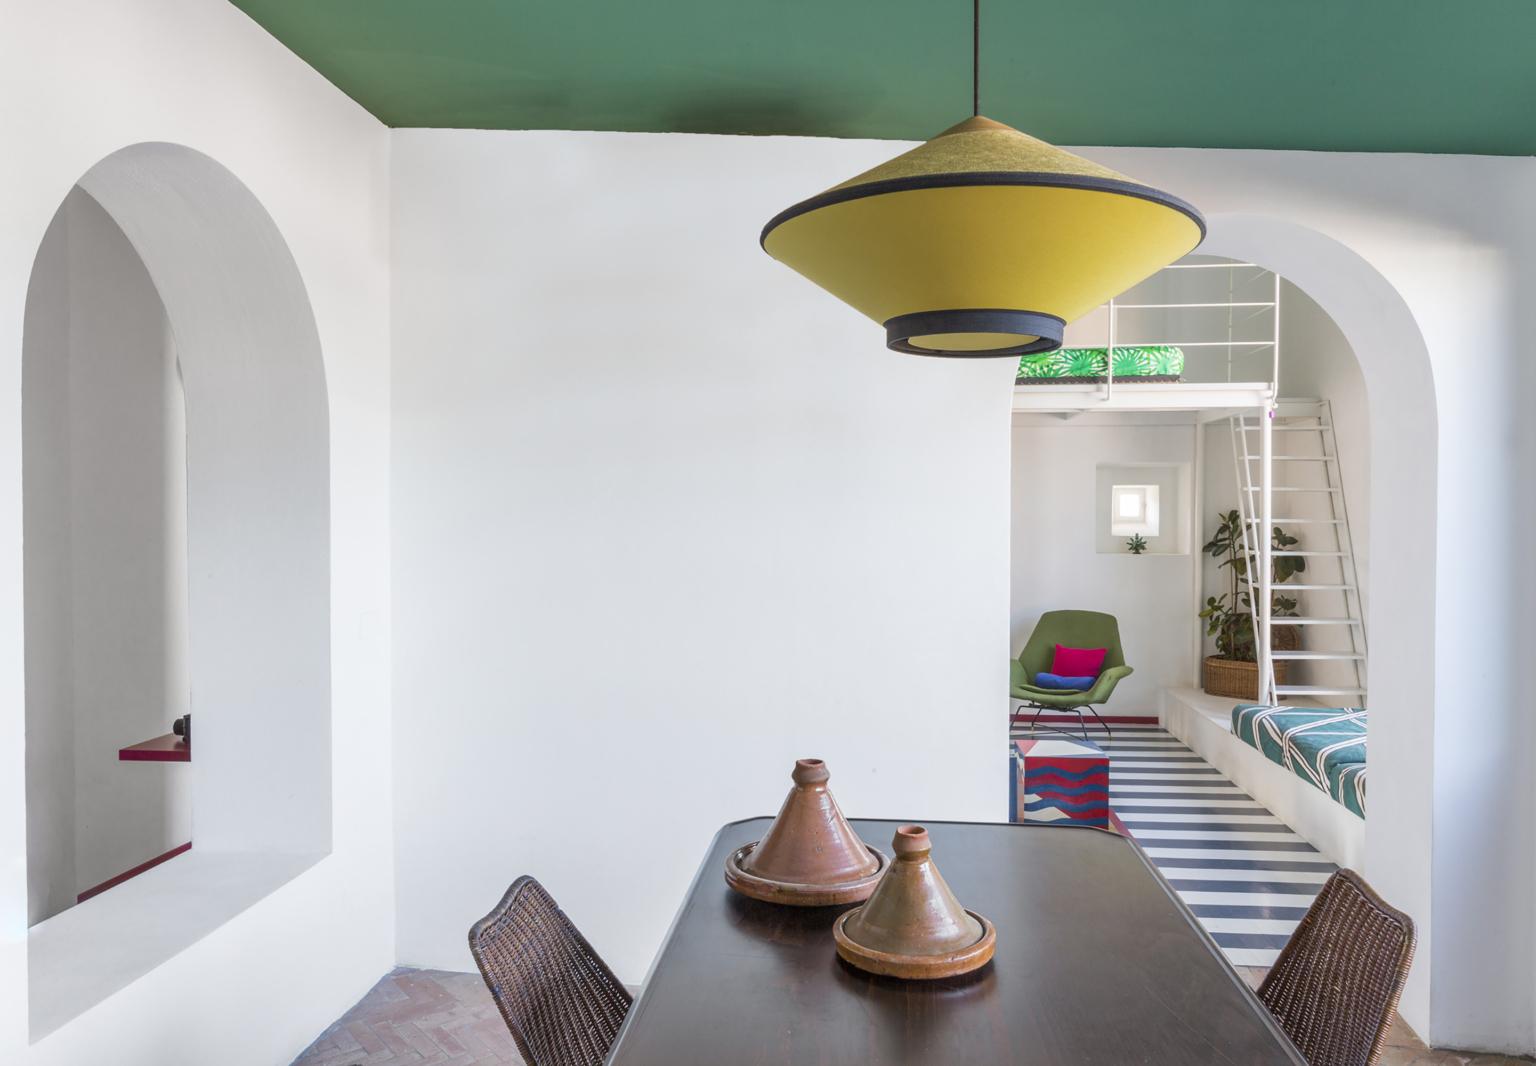 studio strato malaquite house dining 1